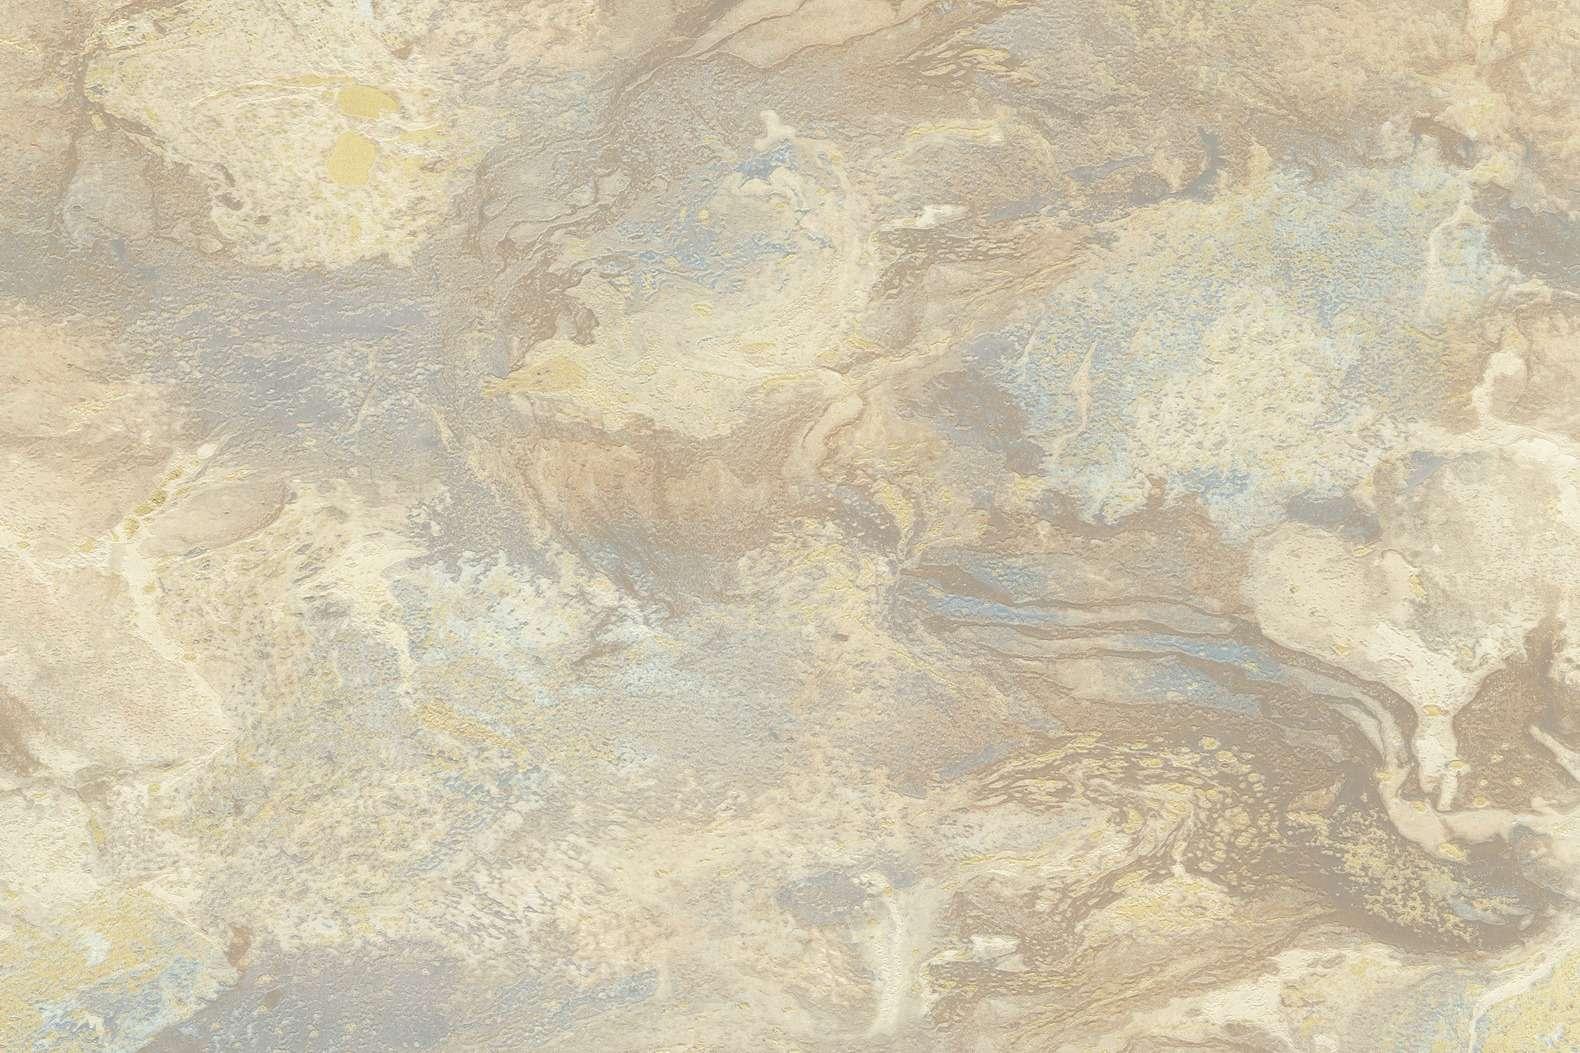 Обои Decori & Decori Carrara 2 — Декори Каррара 2 83670